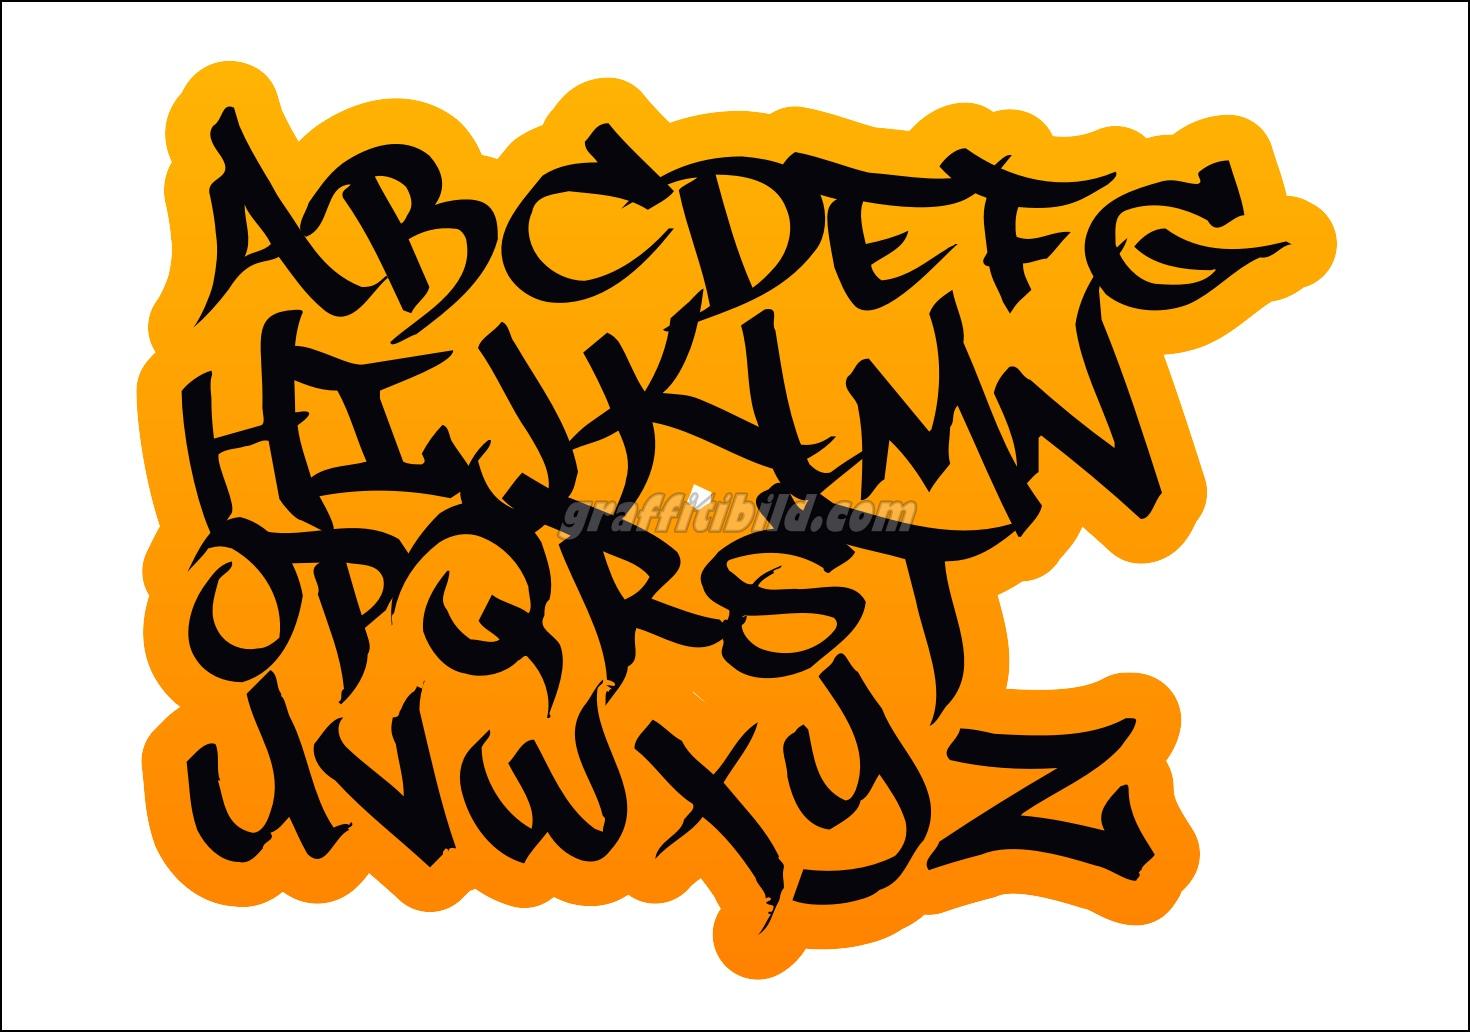 10 Coole Graffiti Abc Buchstaben Ausdrucken Kostenlos Graffiti